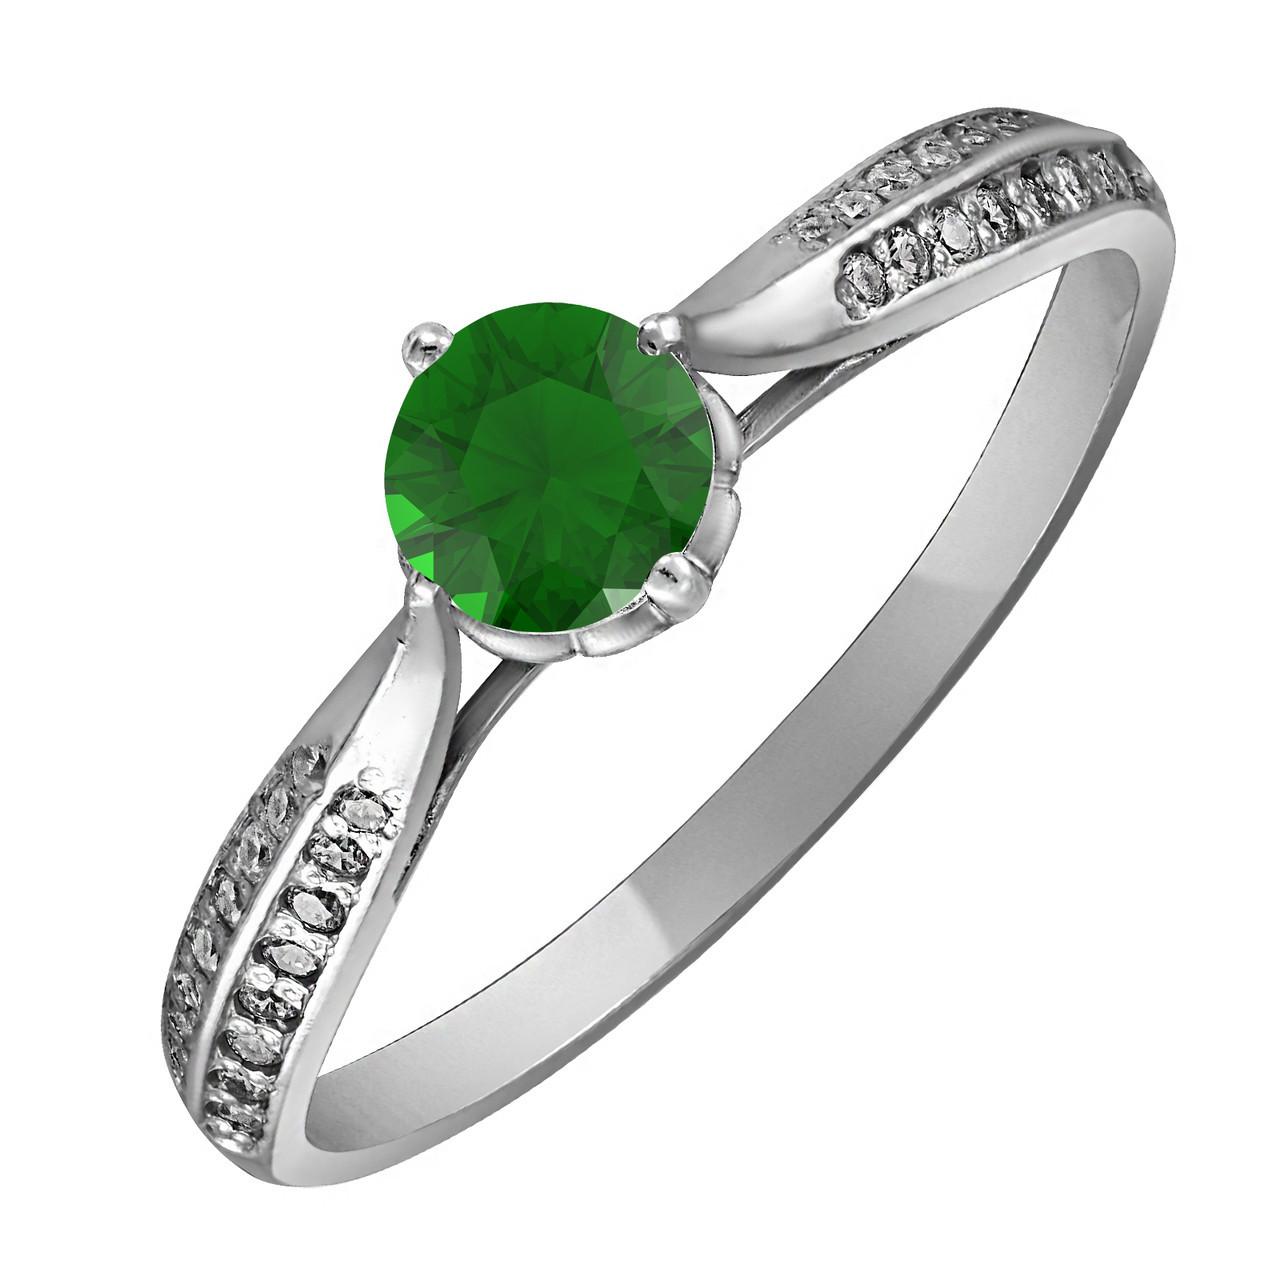 Кольцо из серебра с зелёным кубическим цирконием Twiddle Jewelry 15.5 размер (К007з-15.5)